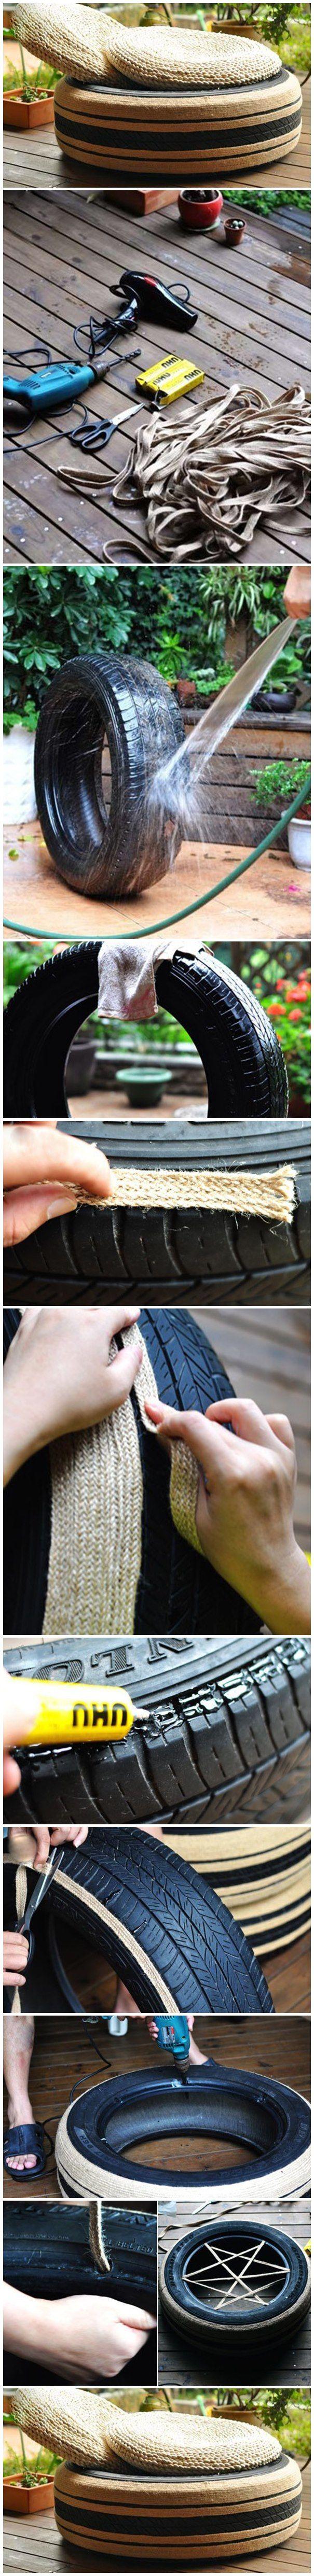 How To Diy Sofa Use Old Tire Diy Sofa Old Tires Diy Home Decor